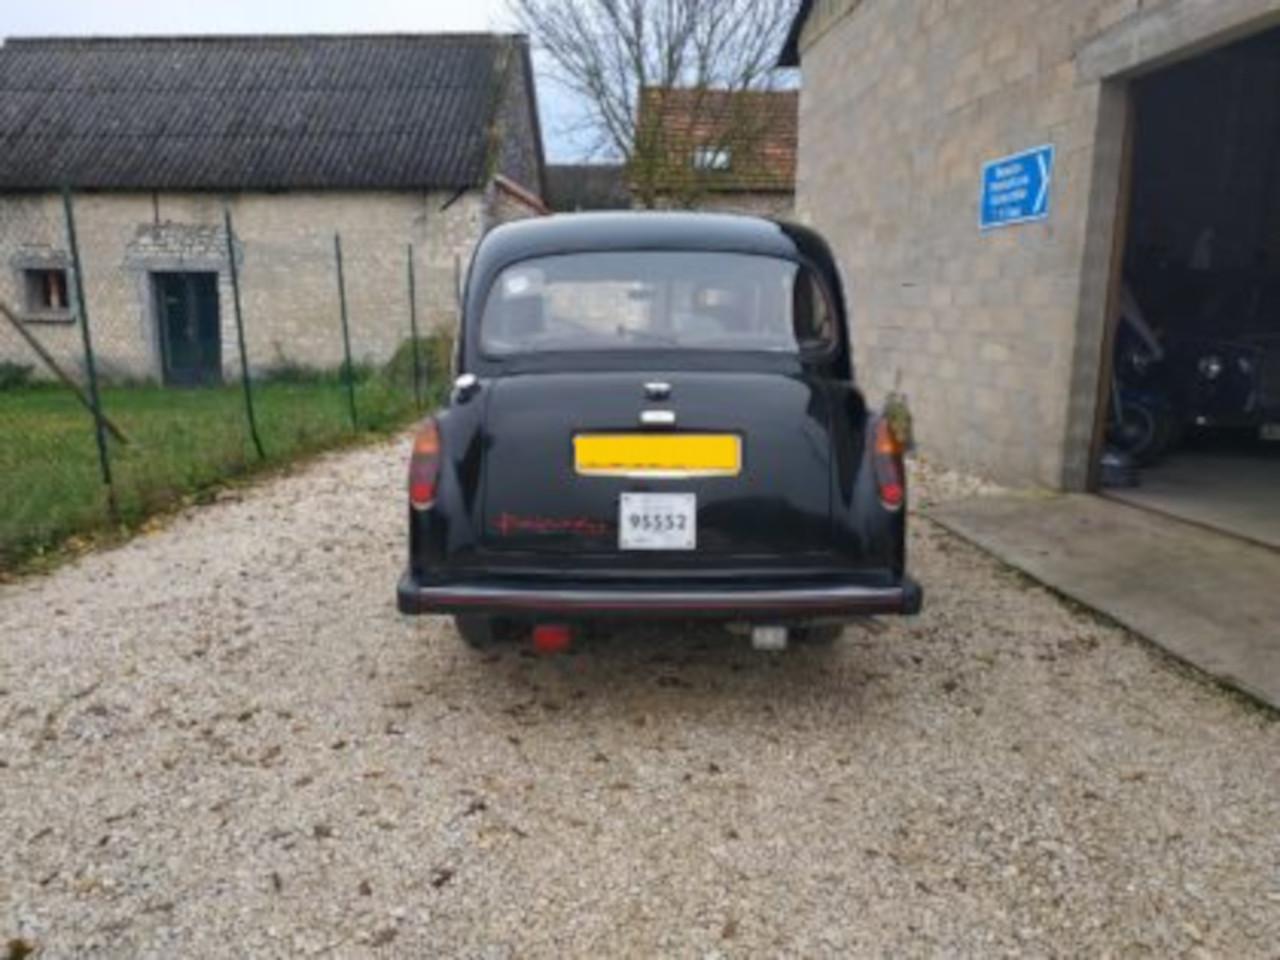 vente taxi anglais fairway en carte grise française